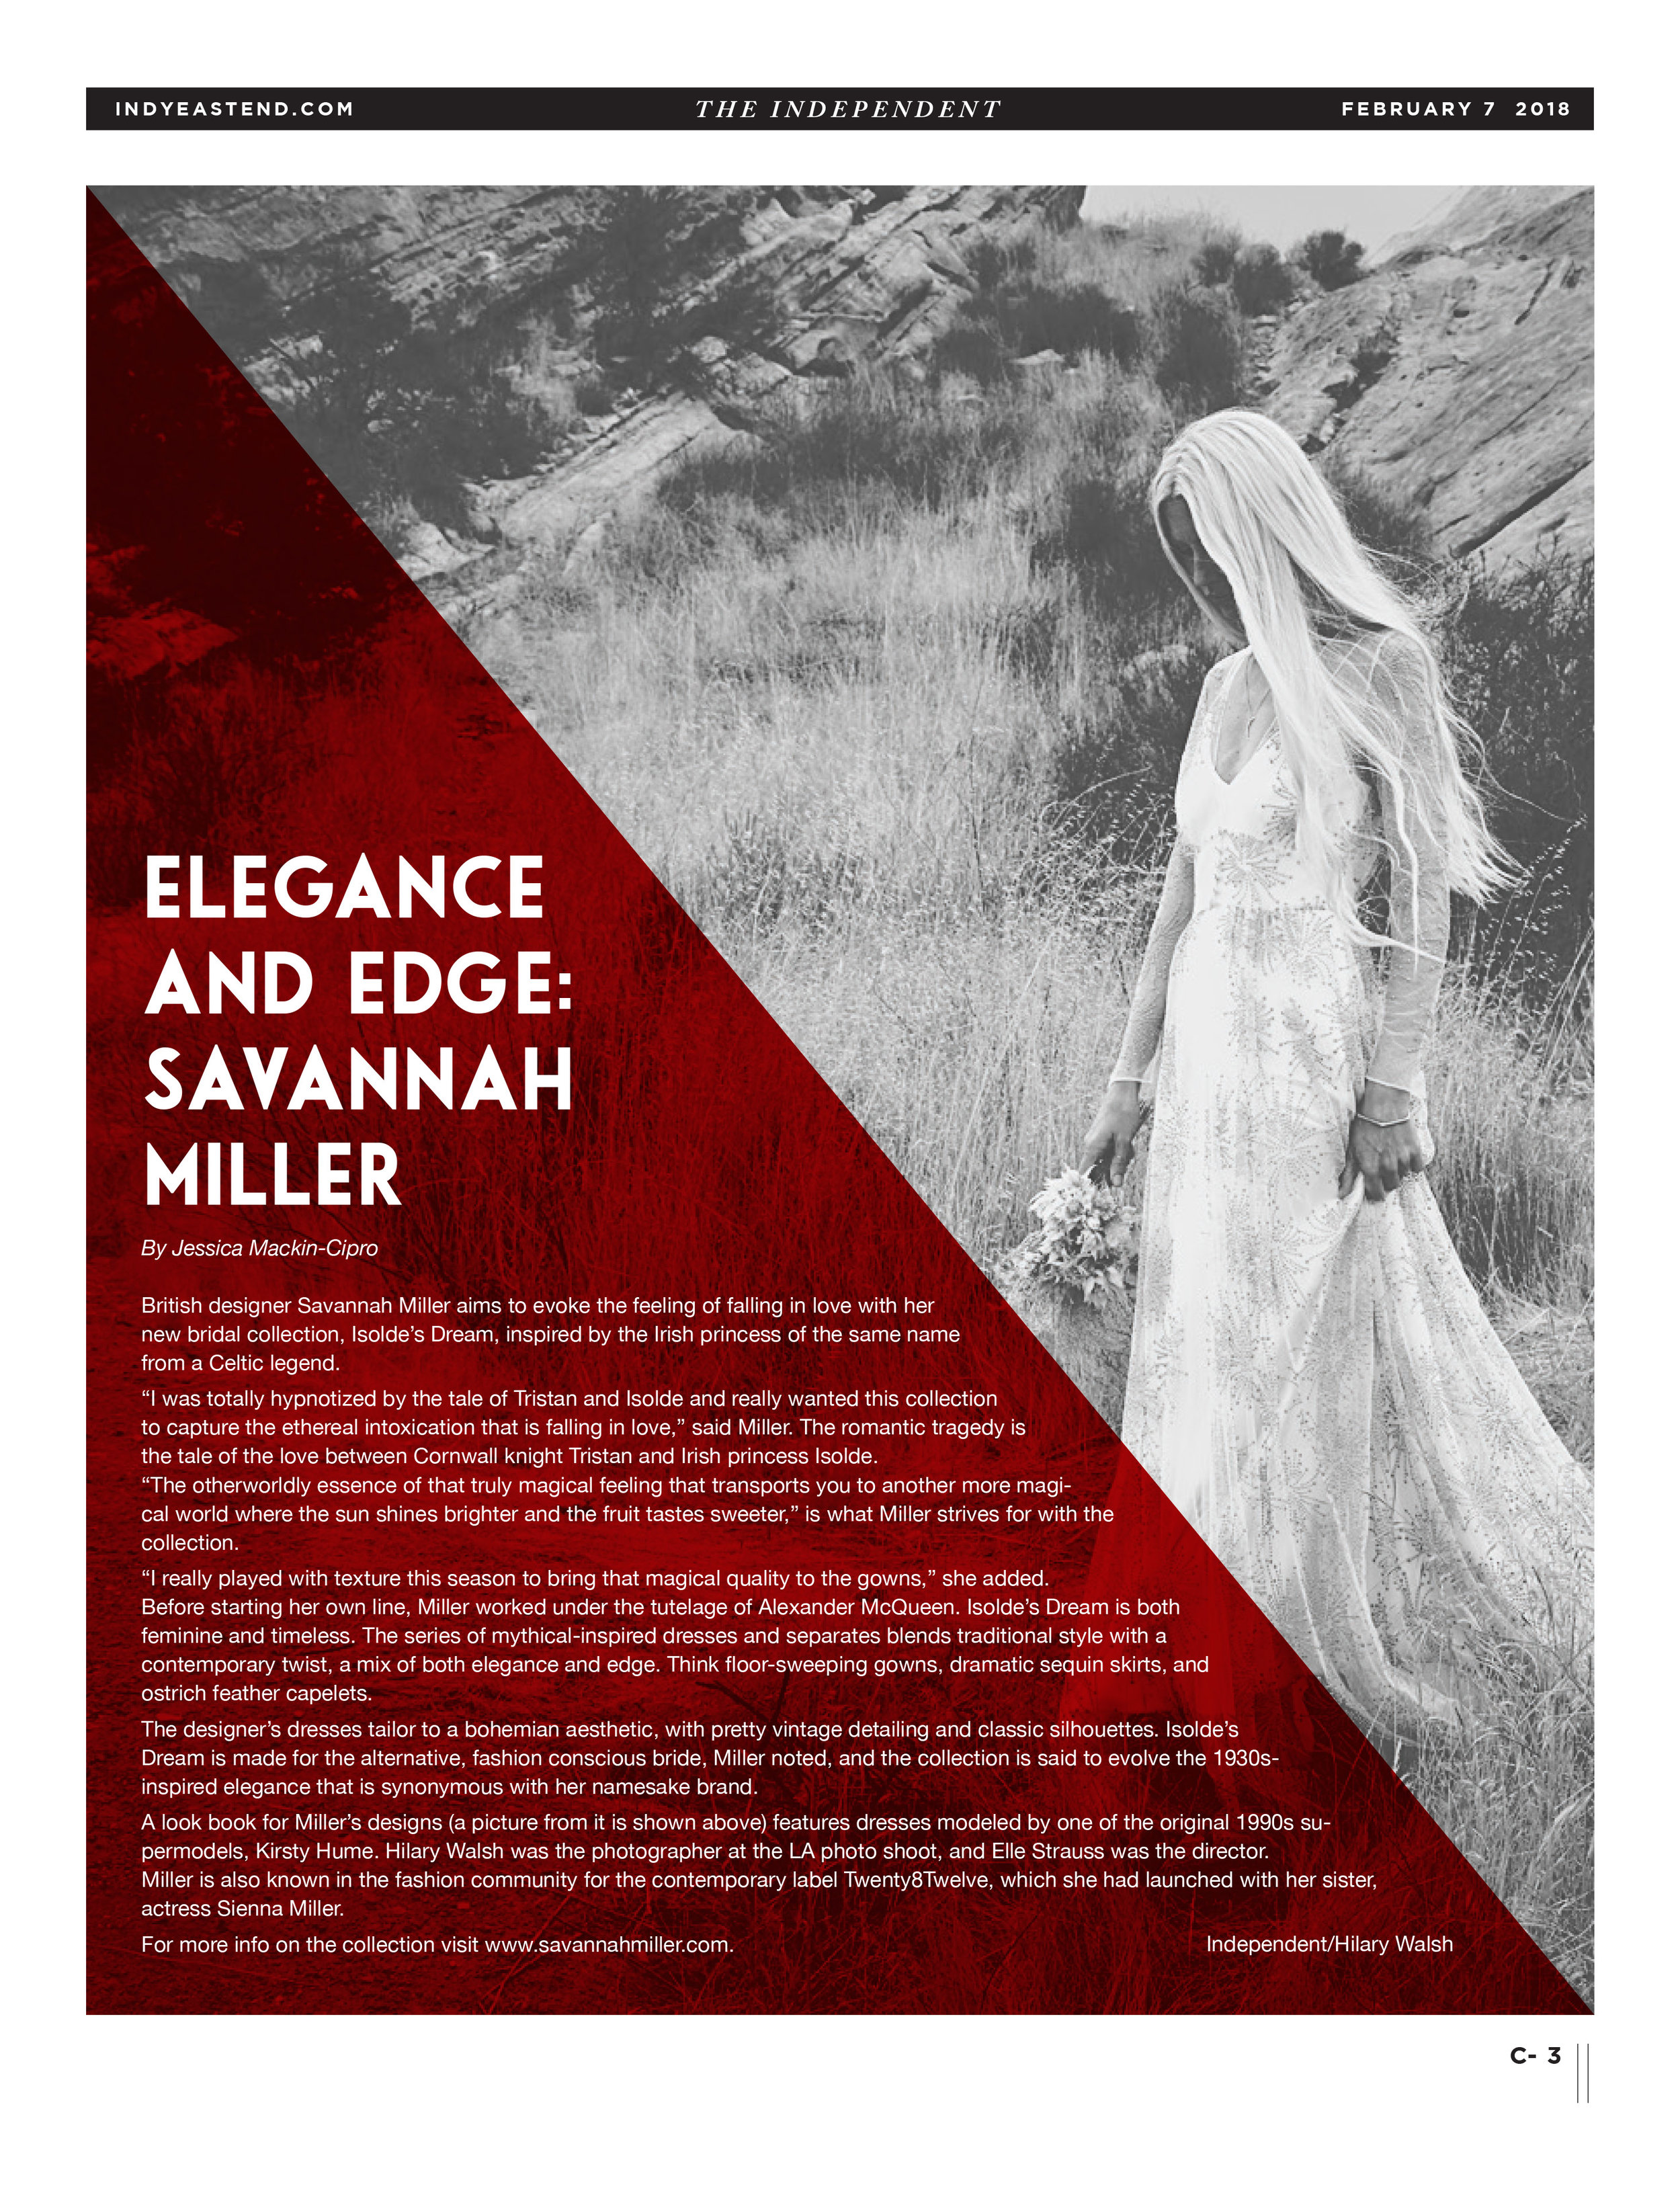 SAVANNAH-SPREAD-2.jpg